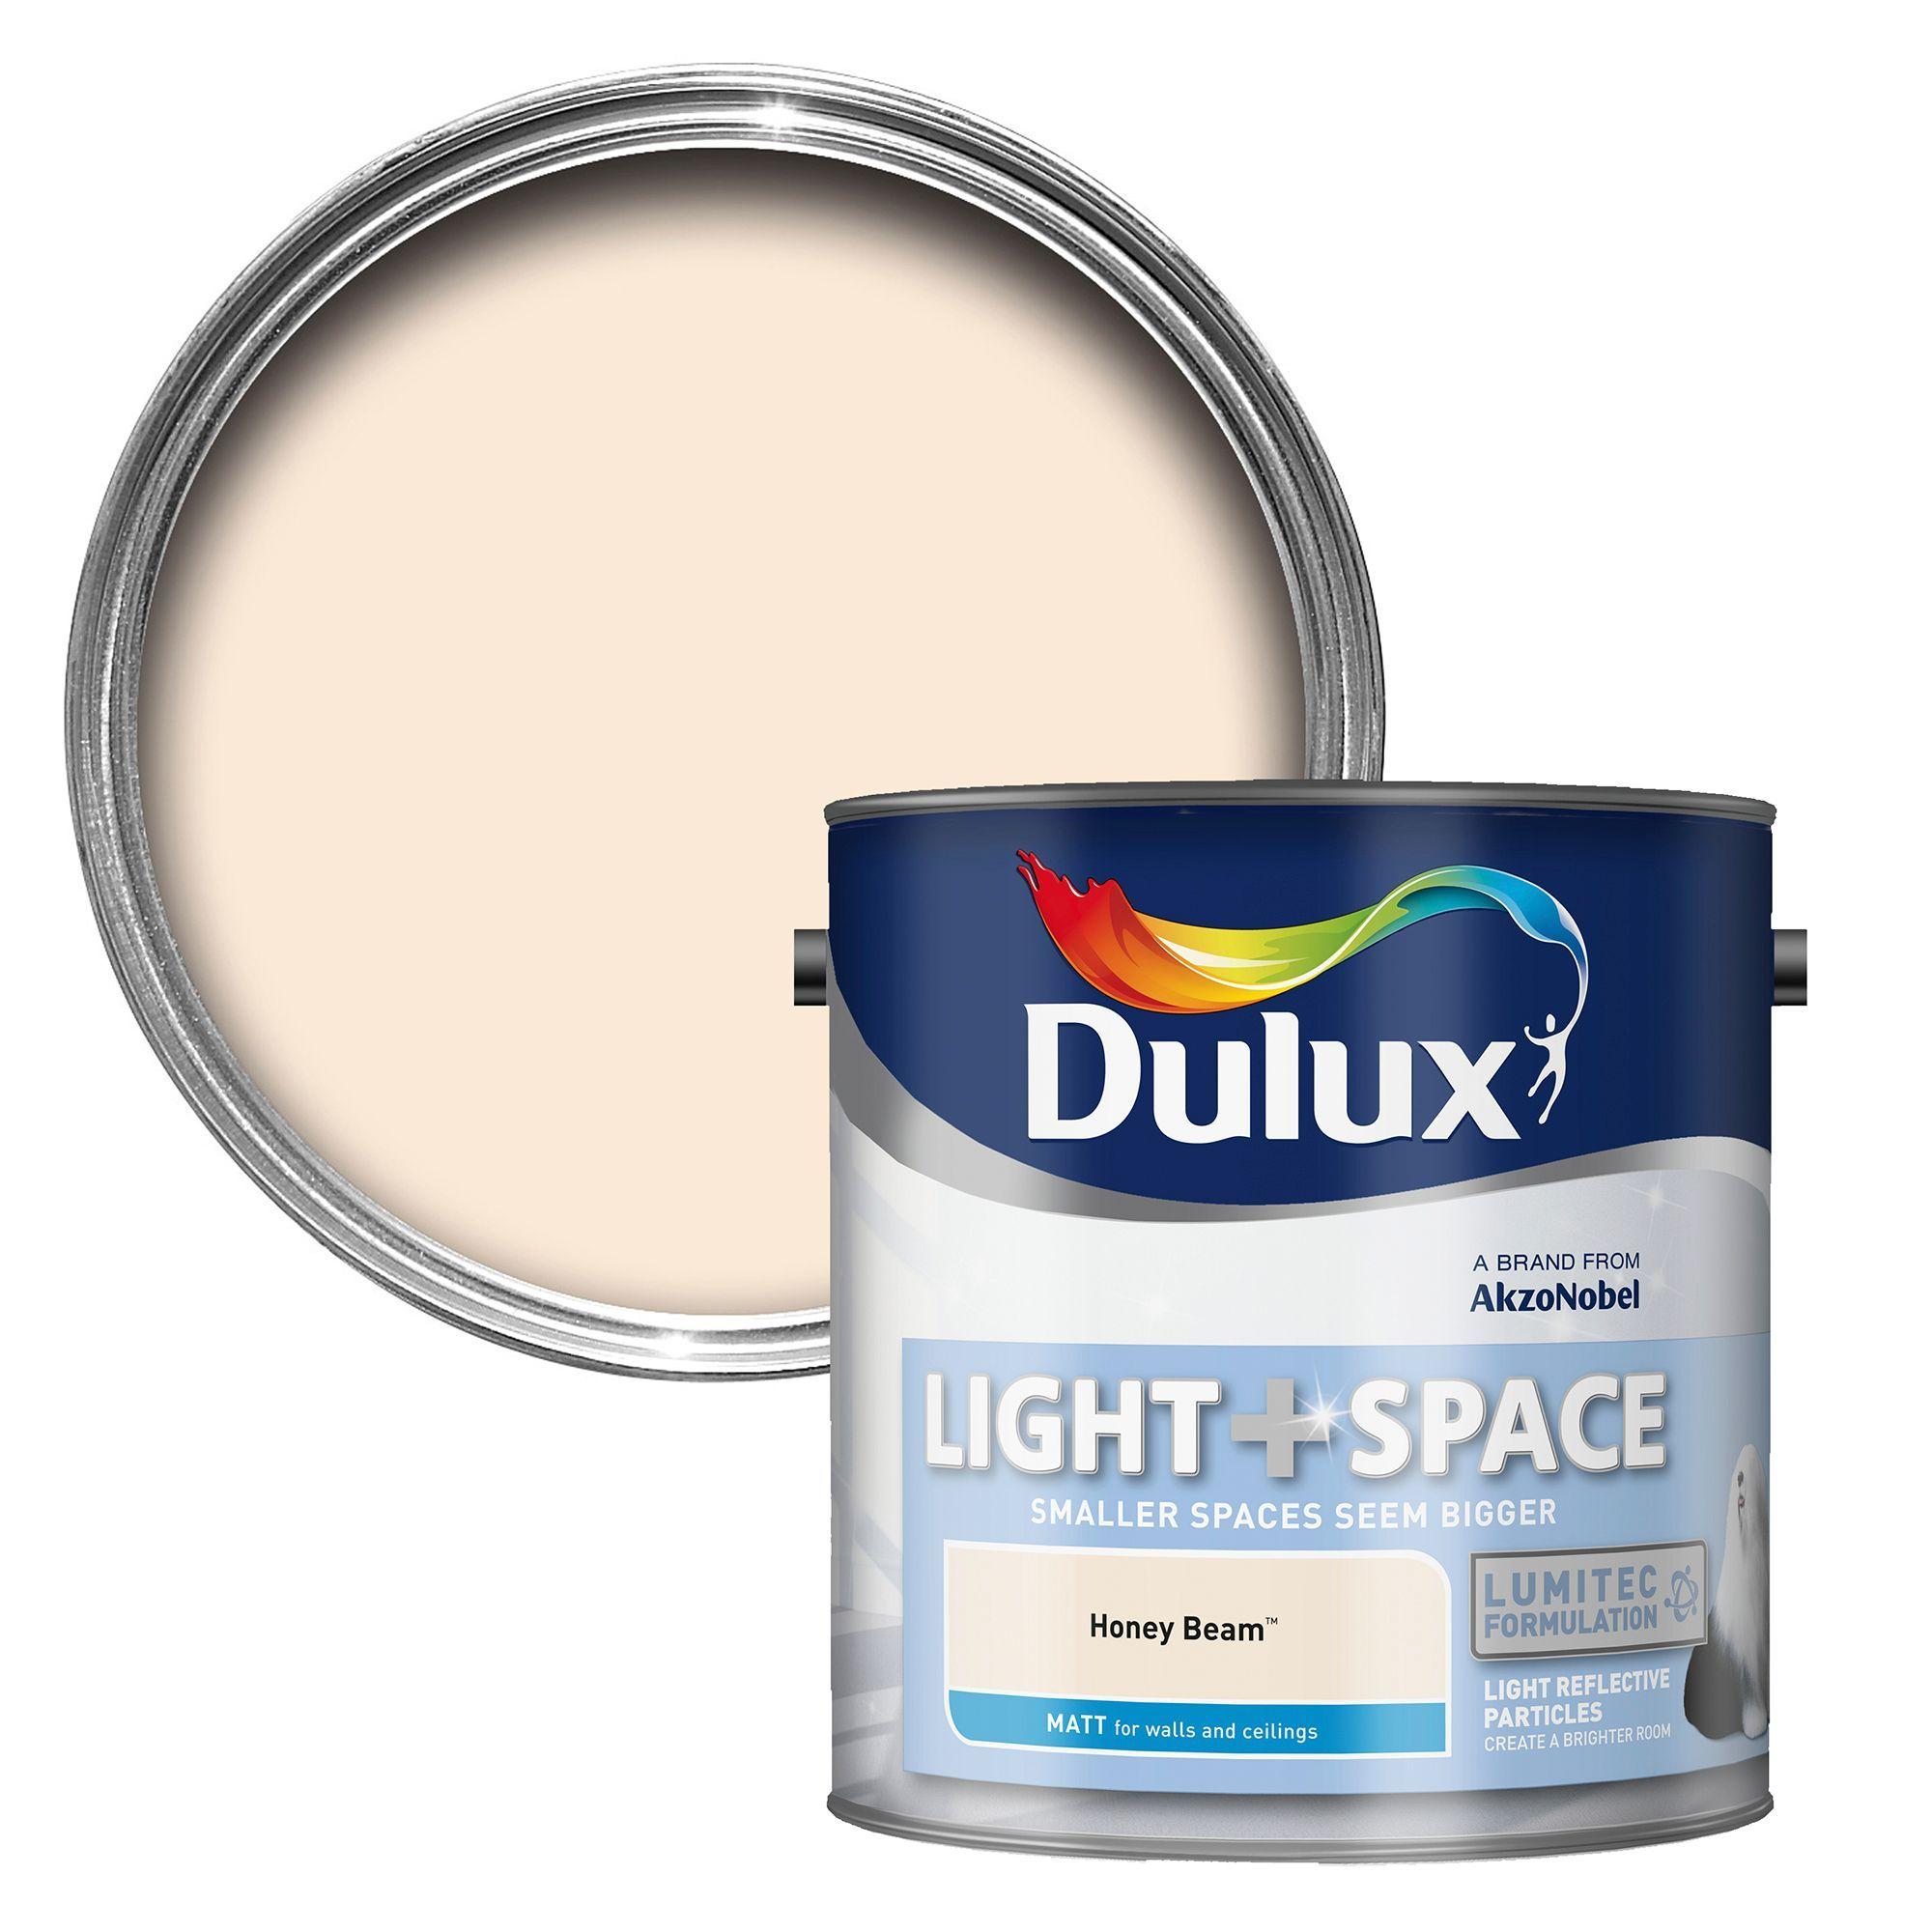 Dulux Light Space Honey Beam Matt Emulsion Paint 2 5l Departments Diy At B Q Dulux Light And Space Dulux Light And Space